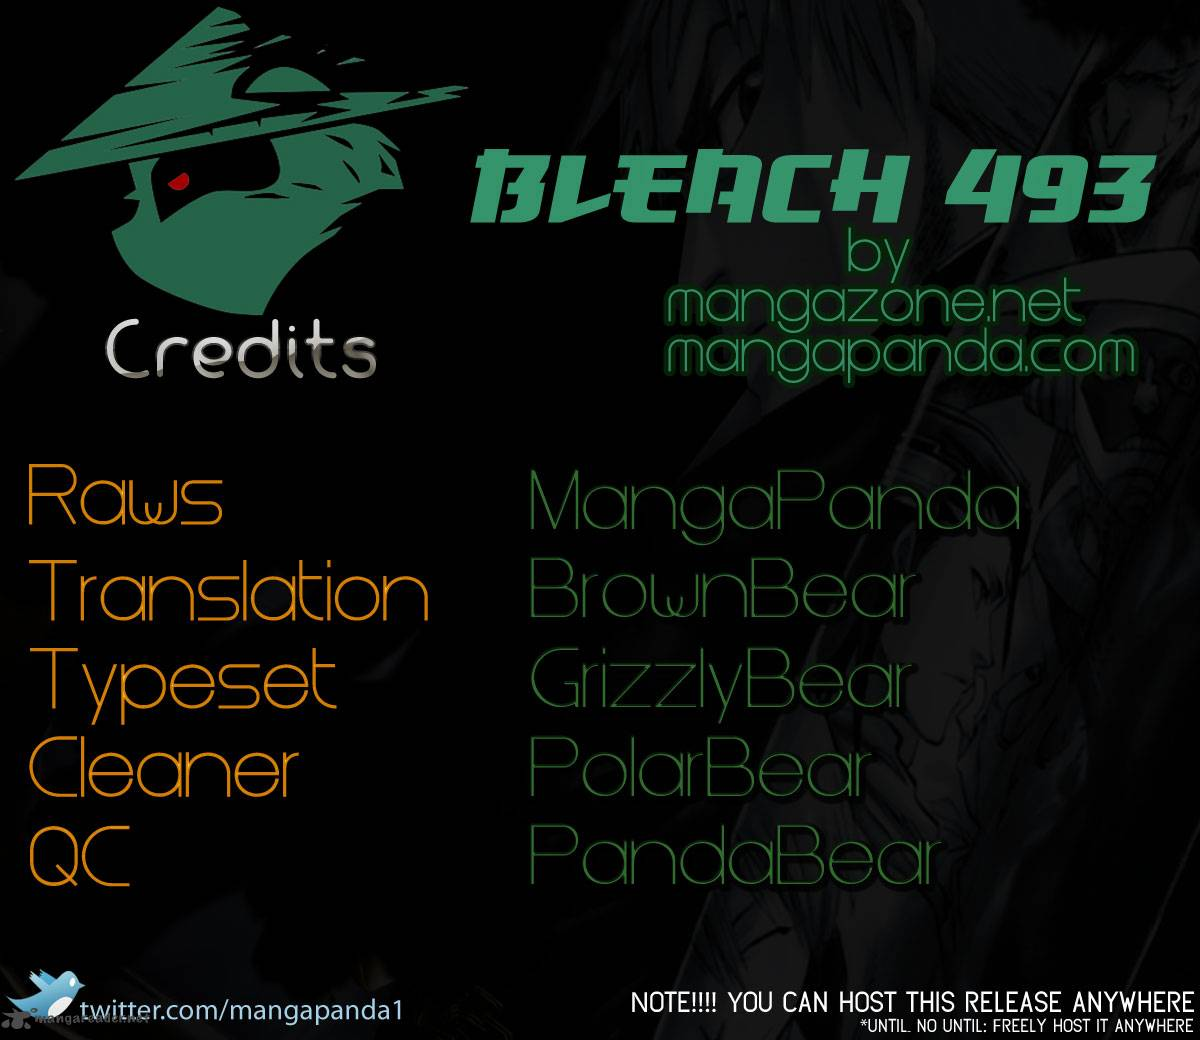 Bleach 493 Light of Happiness